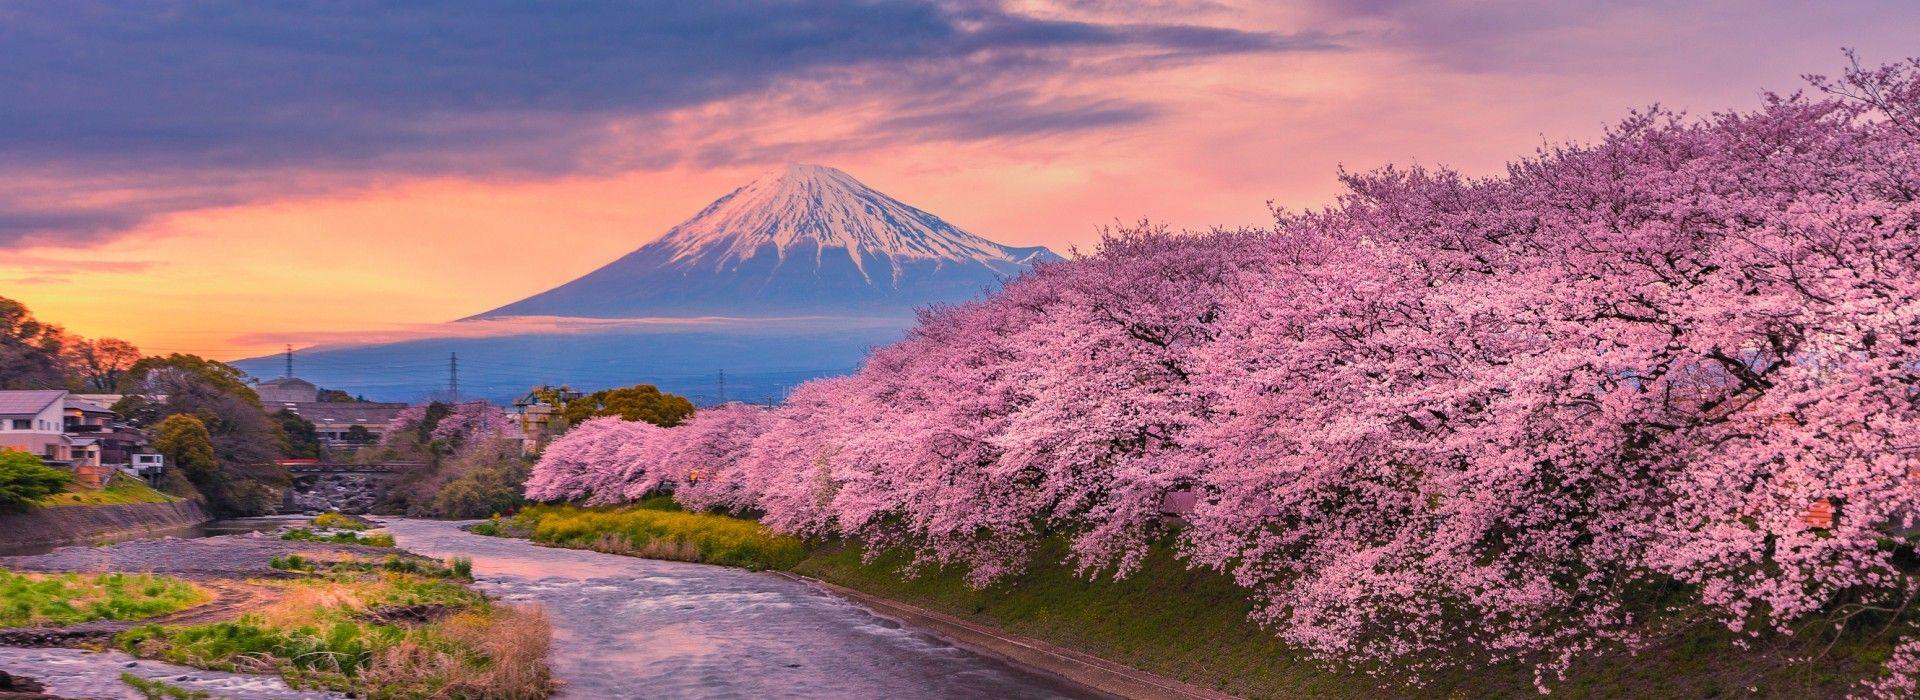 Trekking Tours in Kyoto